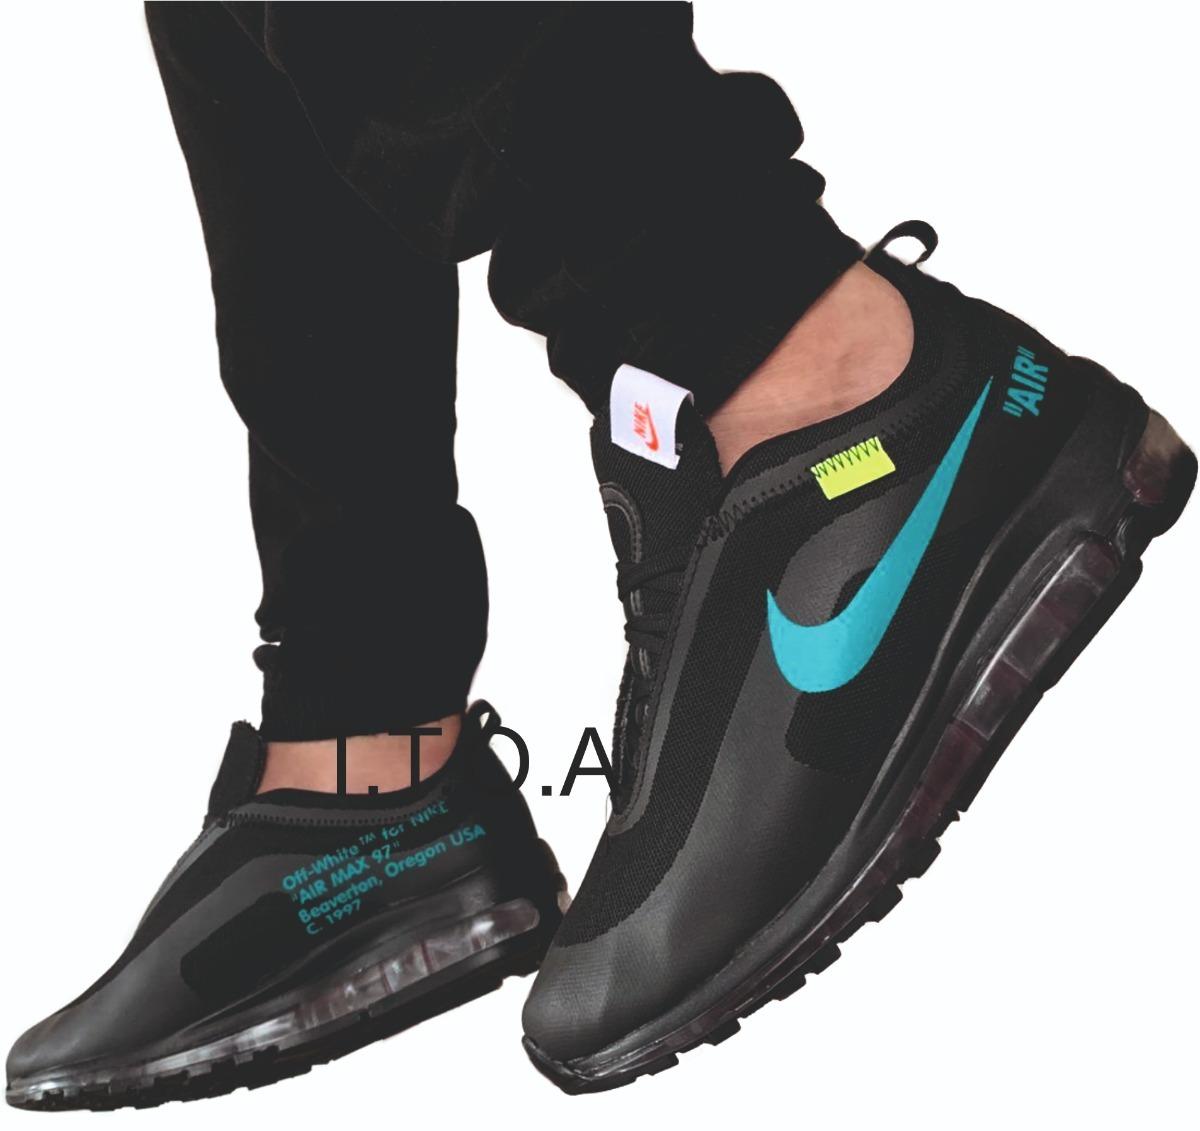 ce30d495 zapatos deportivos botas - tenis de caballero tallas 35/43. Cargando zoom.